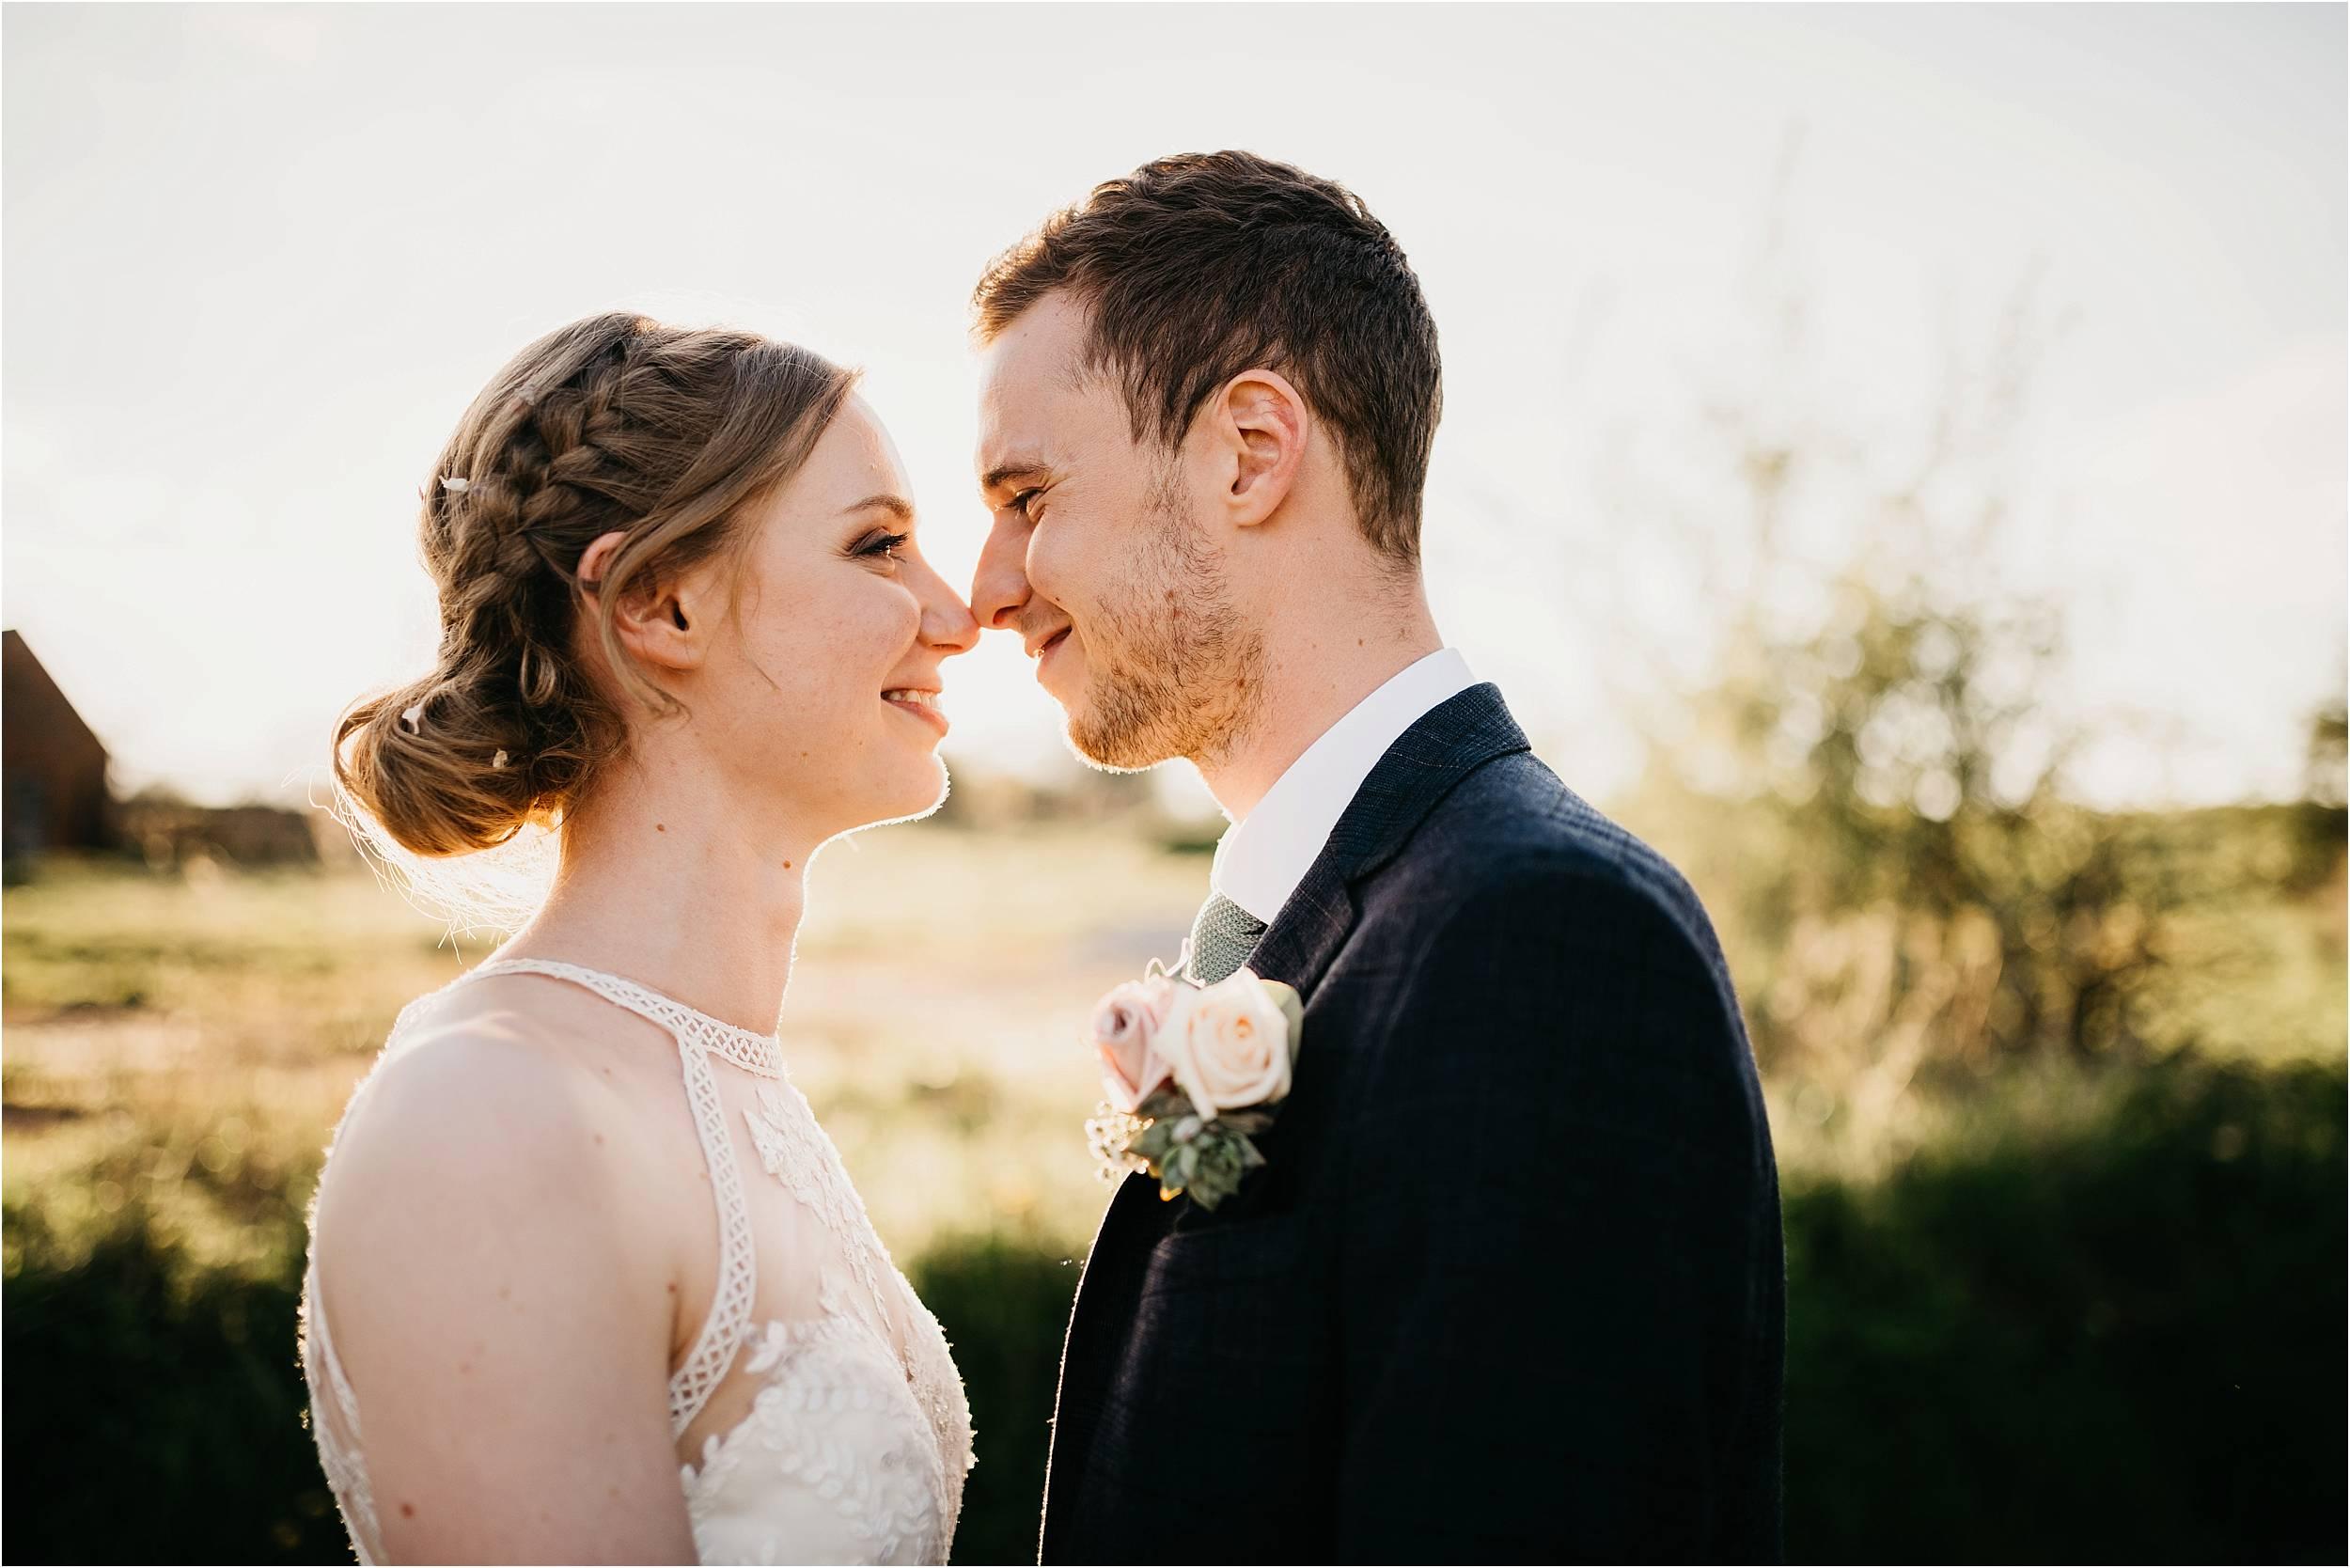 Kedleston Country House Wedding Photography_0092.jpg